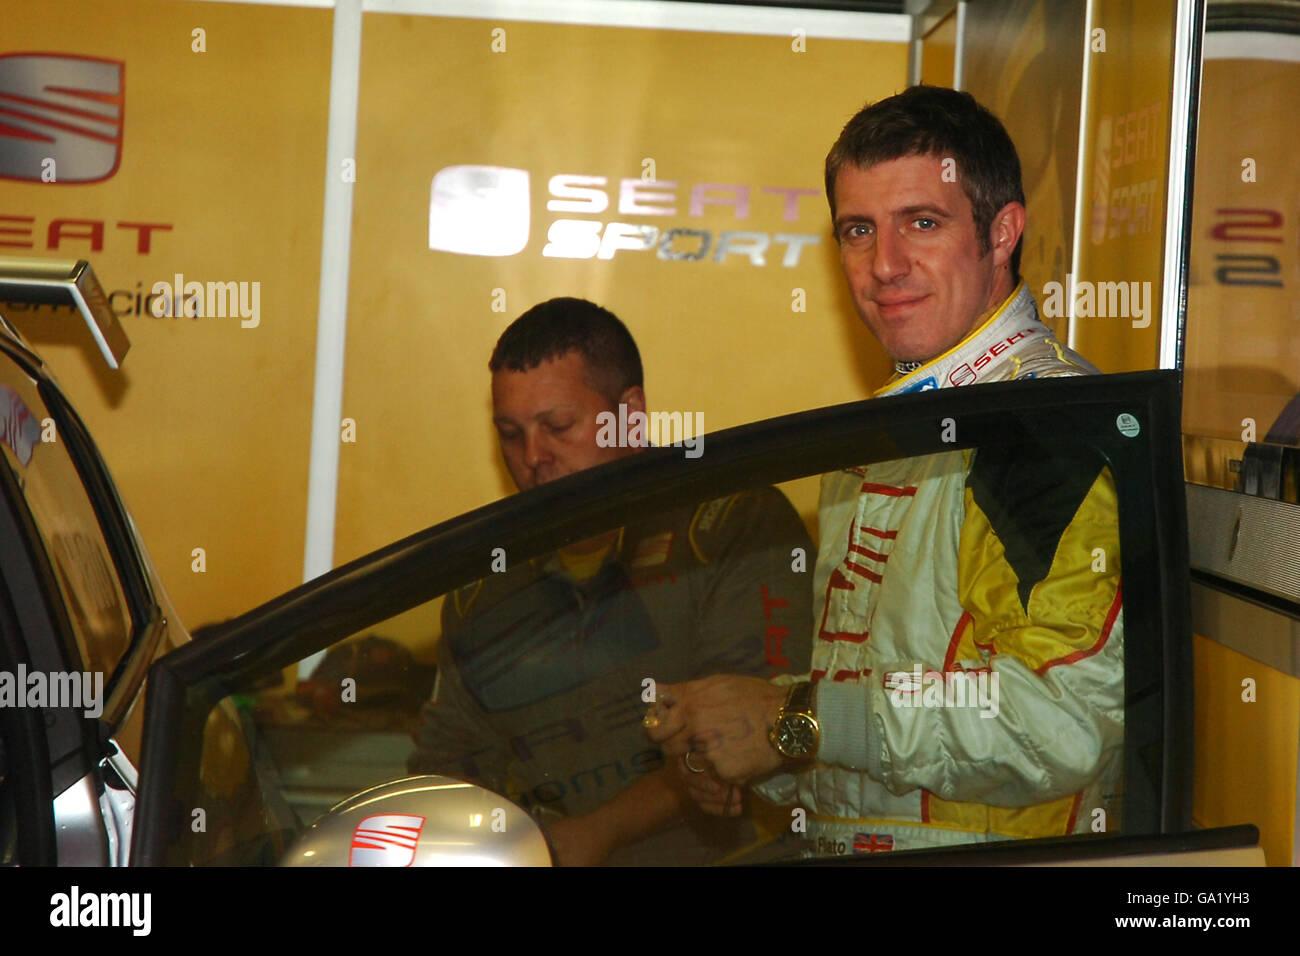 Deportes de Motor - Dunlop British Touring Car Championship - Donington Park Imagen De Stock